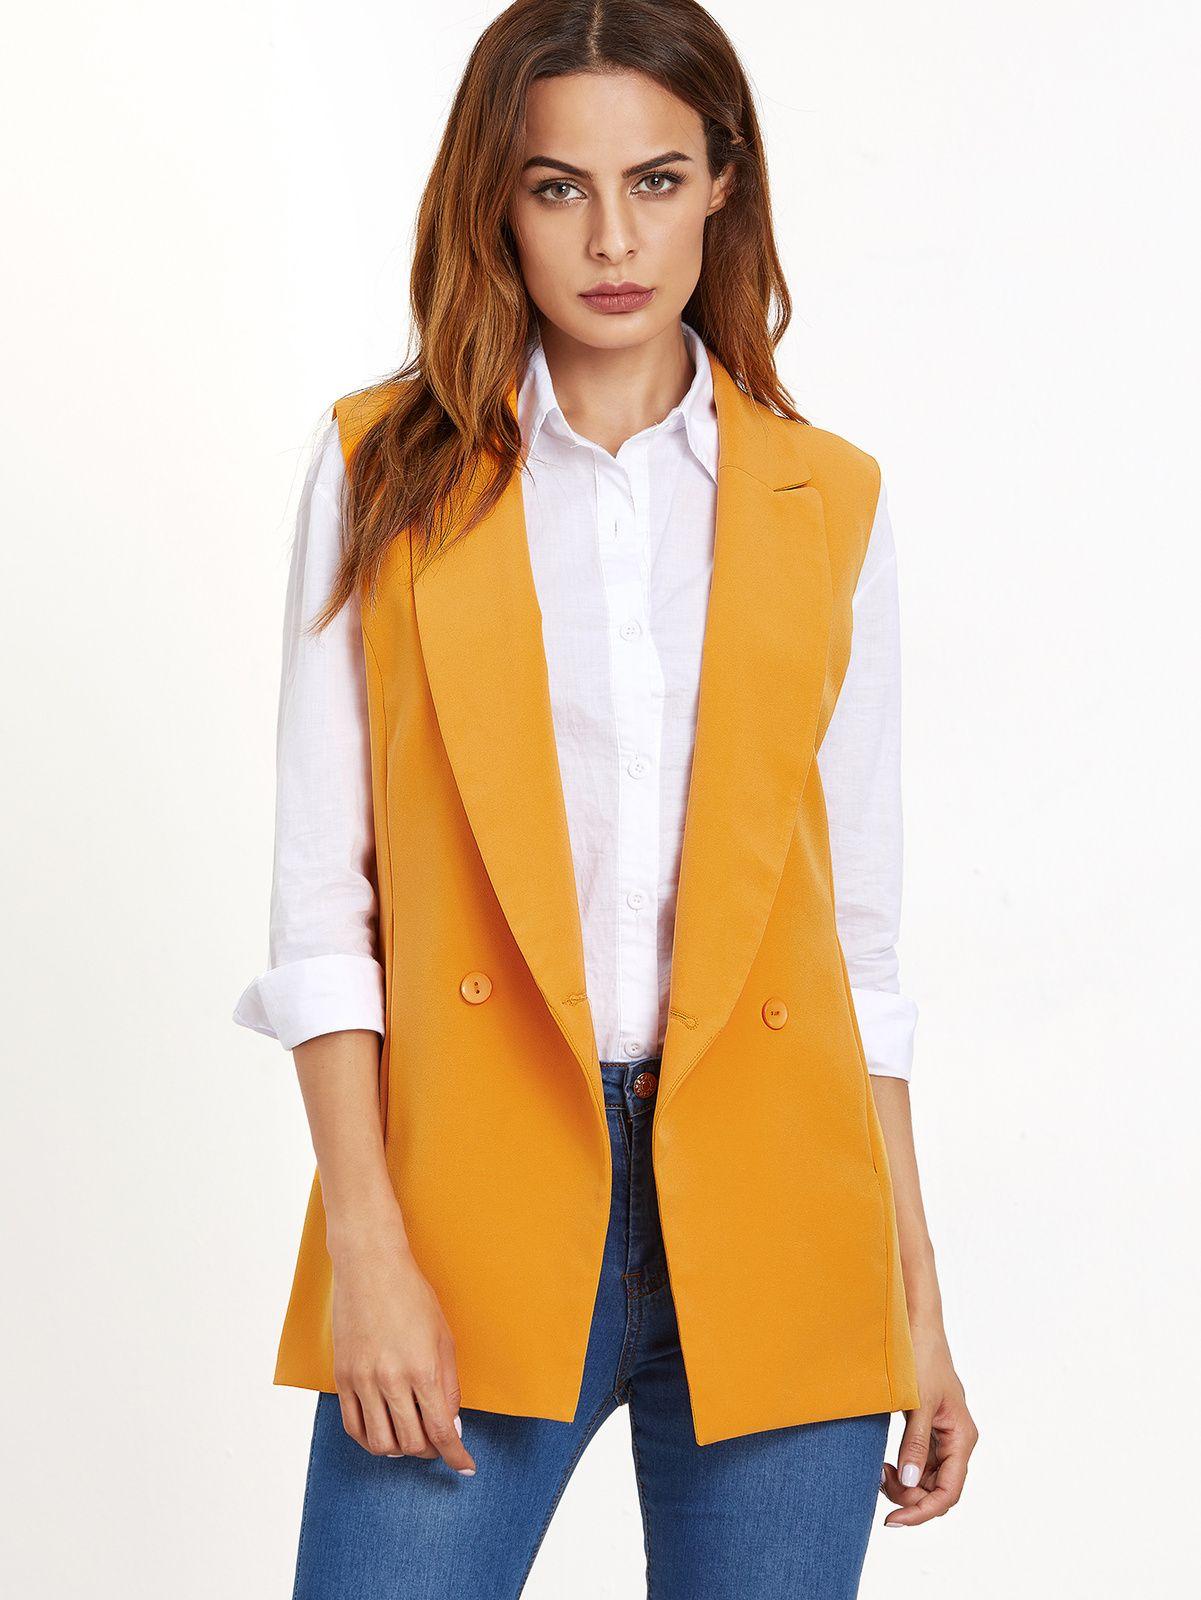 Womens Yellow Double Breasted Sleeveless Blazer